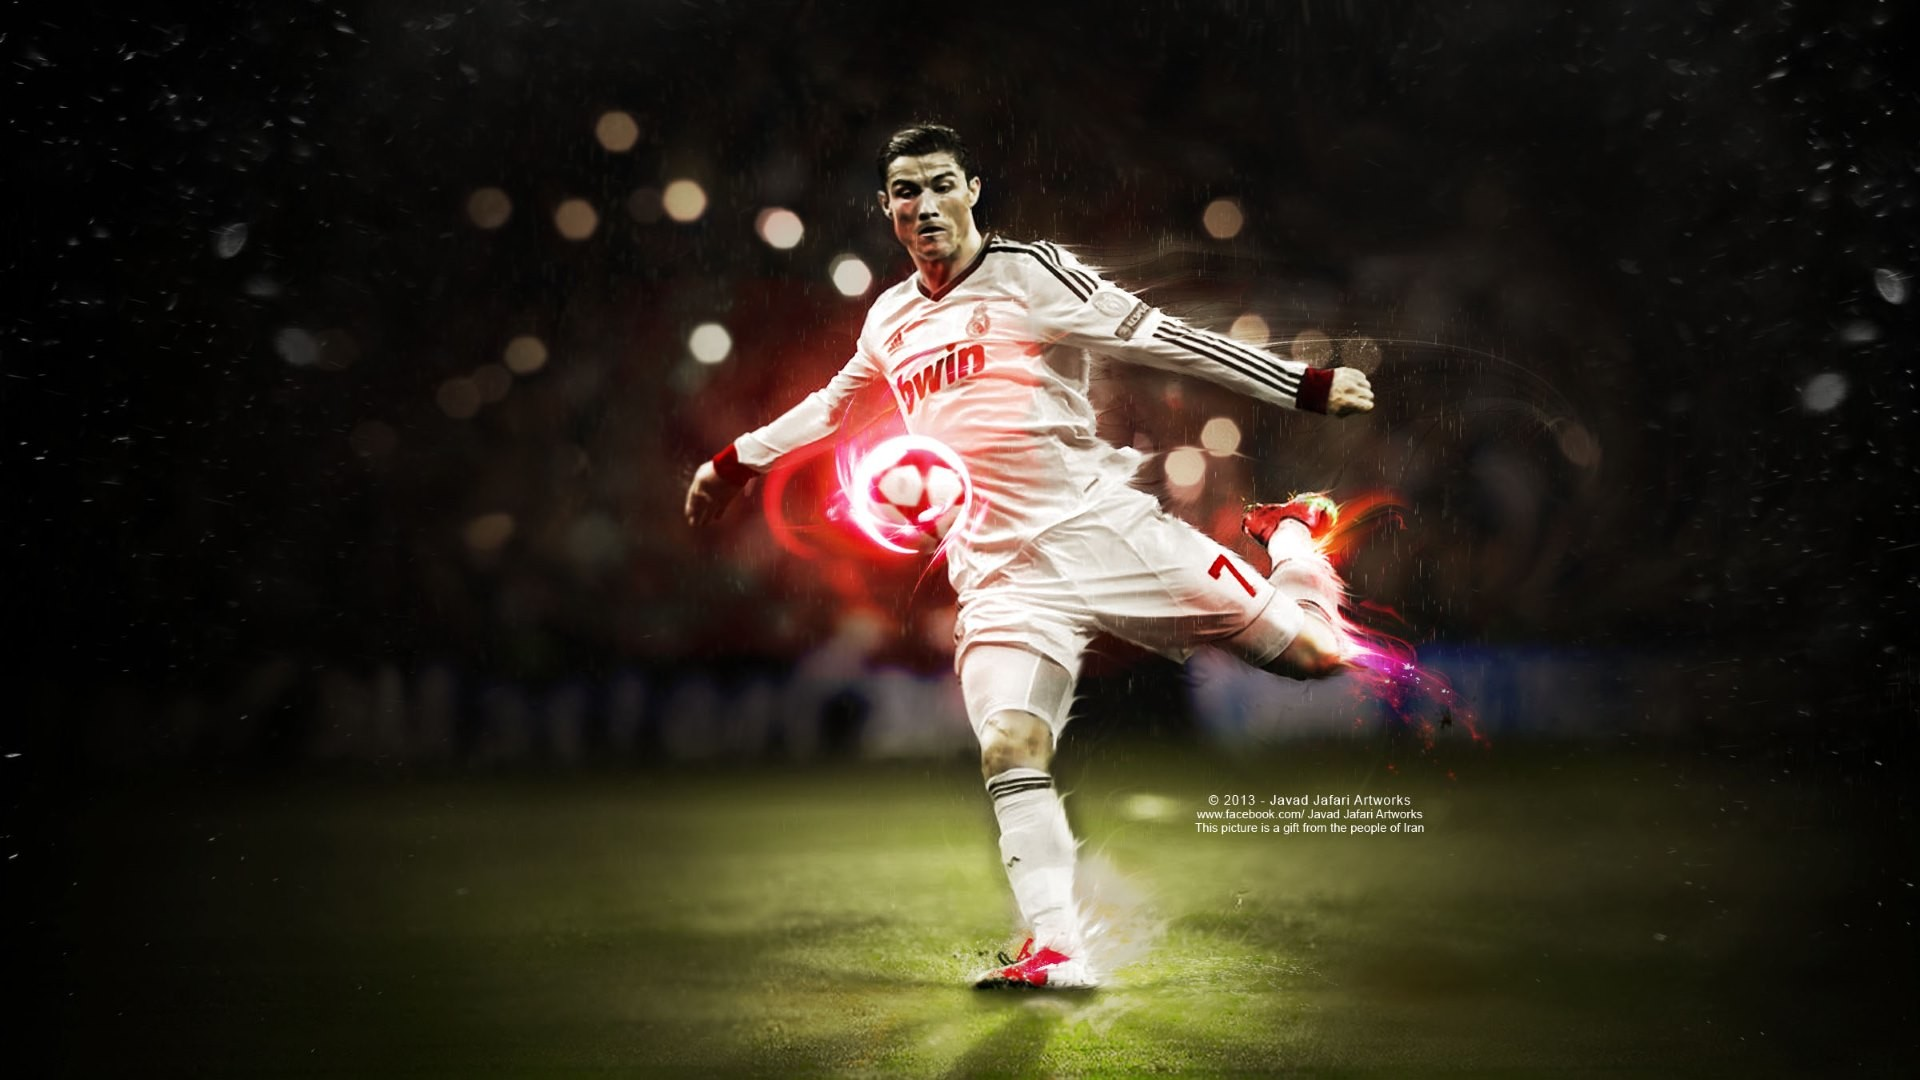 Cristiano Ronaldo Wallpapers 2016-2017 in HD   Soccer   Football